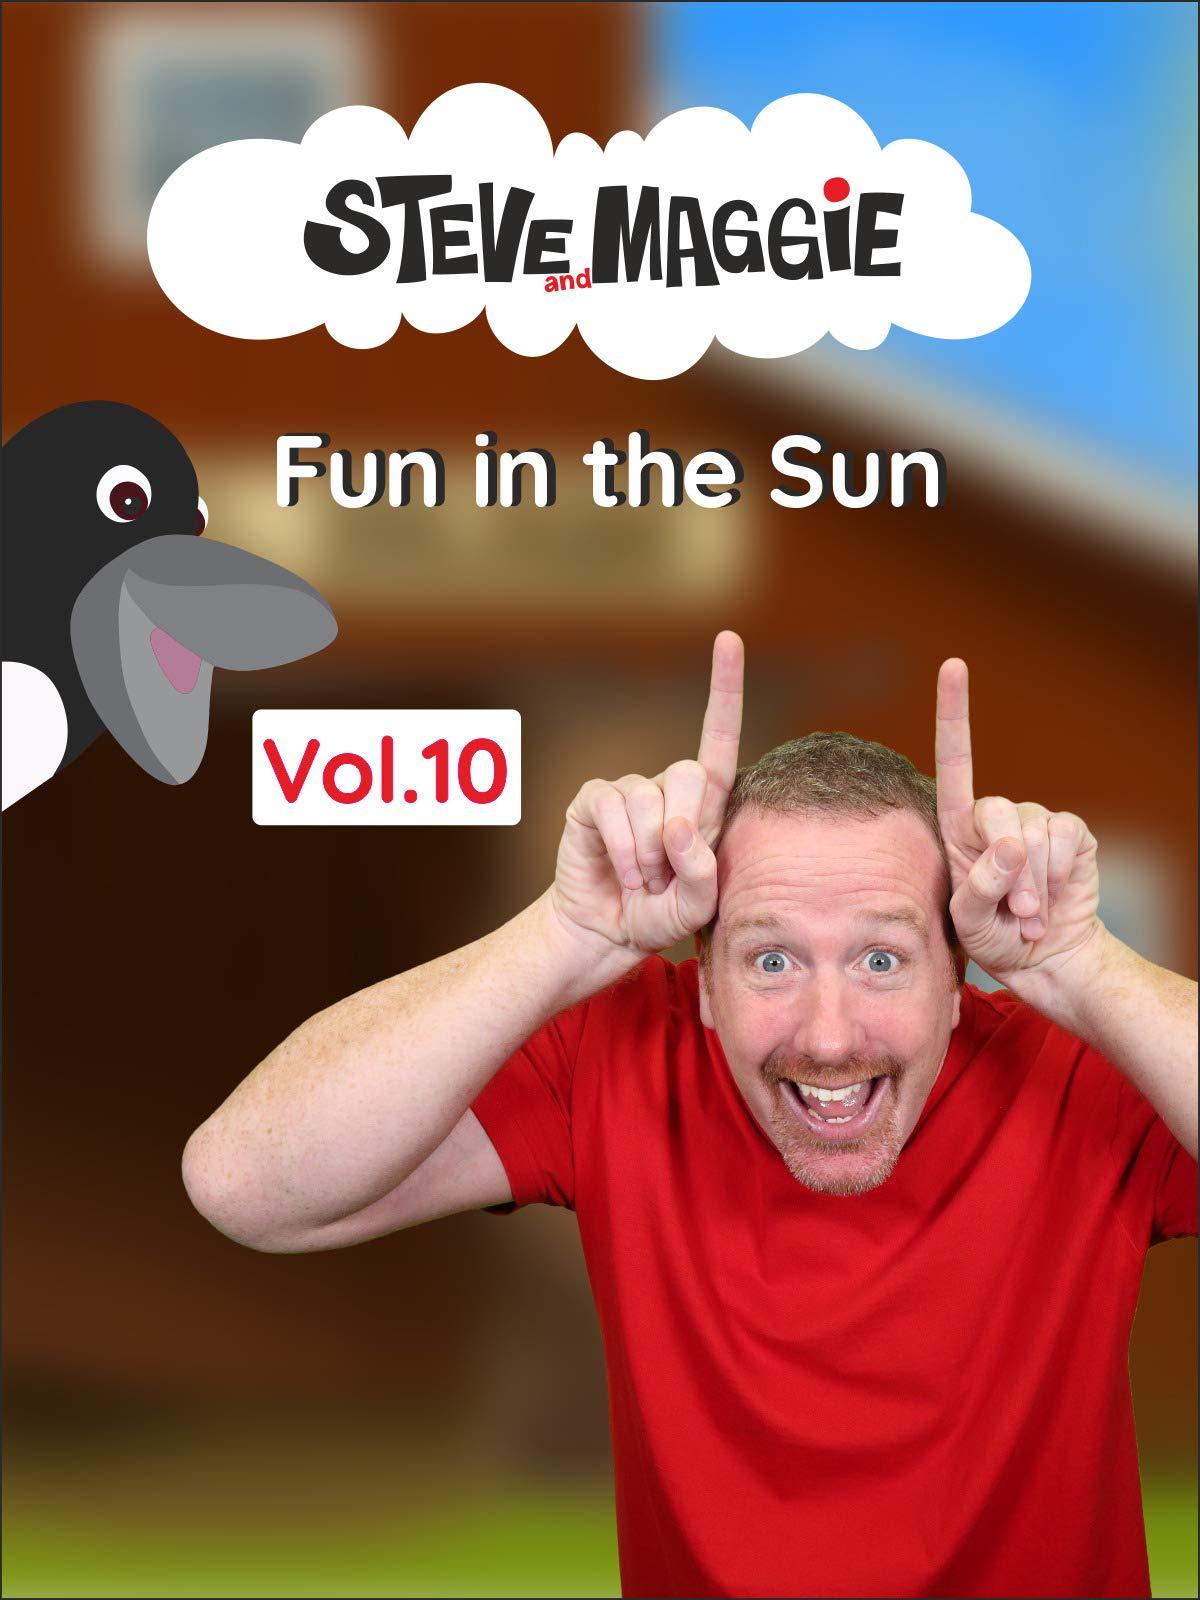 Steve and Maggie - Fun in the Sun (Vol. 10) on Amazon Prime Video UK